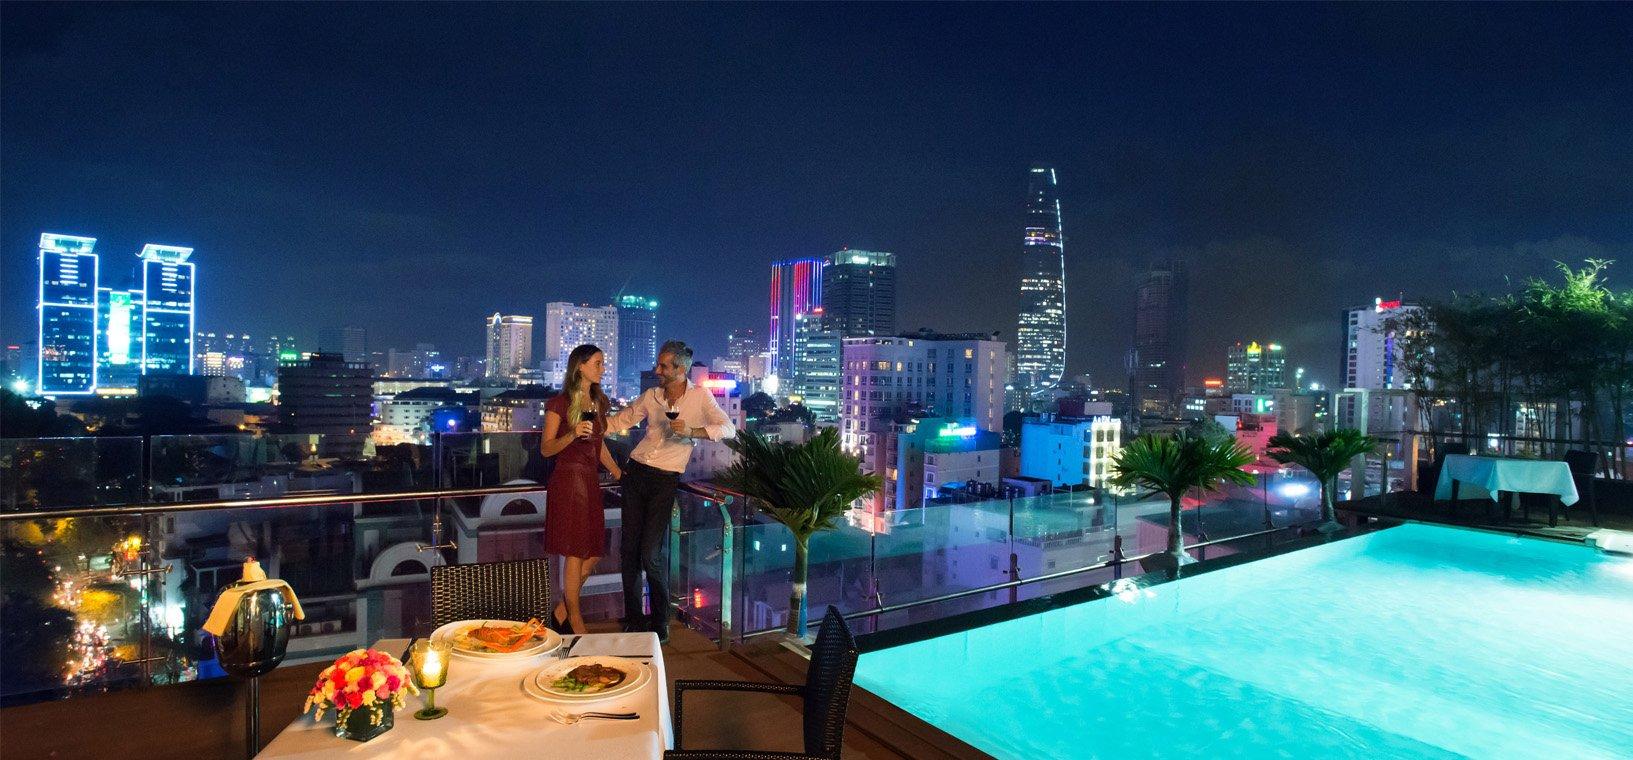 Hotels in Ho Chi Minh City near Tan Binh - Tan Son Nhat